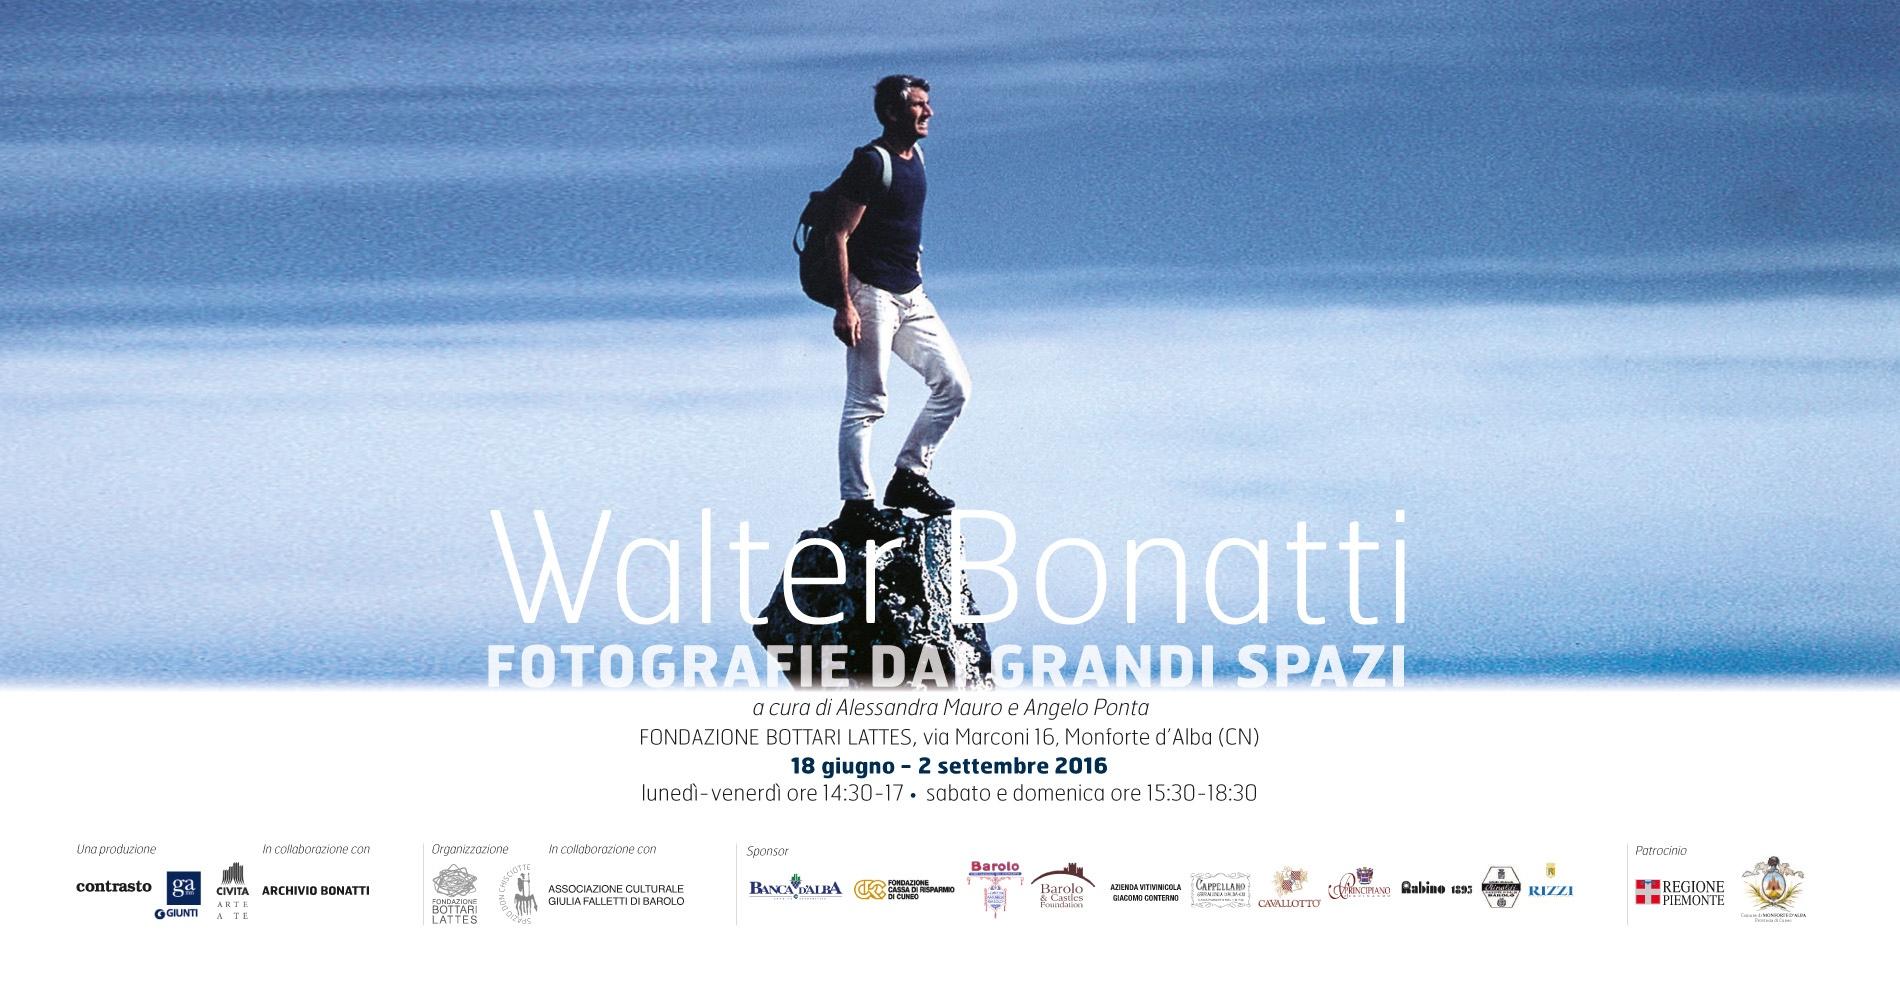 Walter BonattiFotografie dai grandi spazi